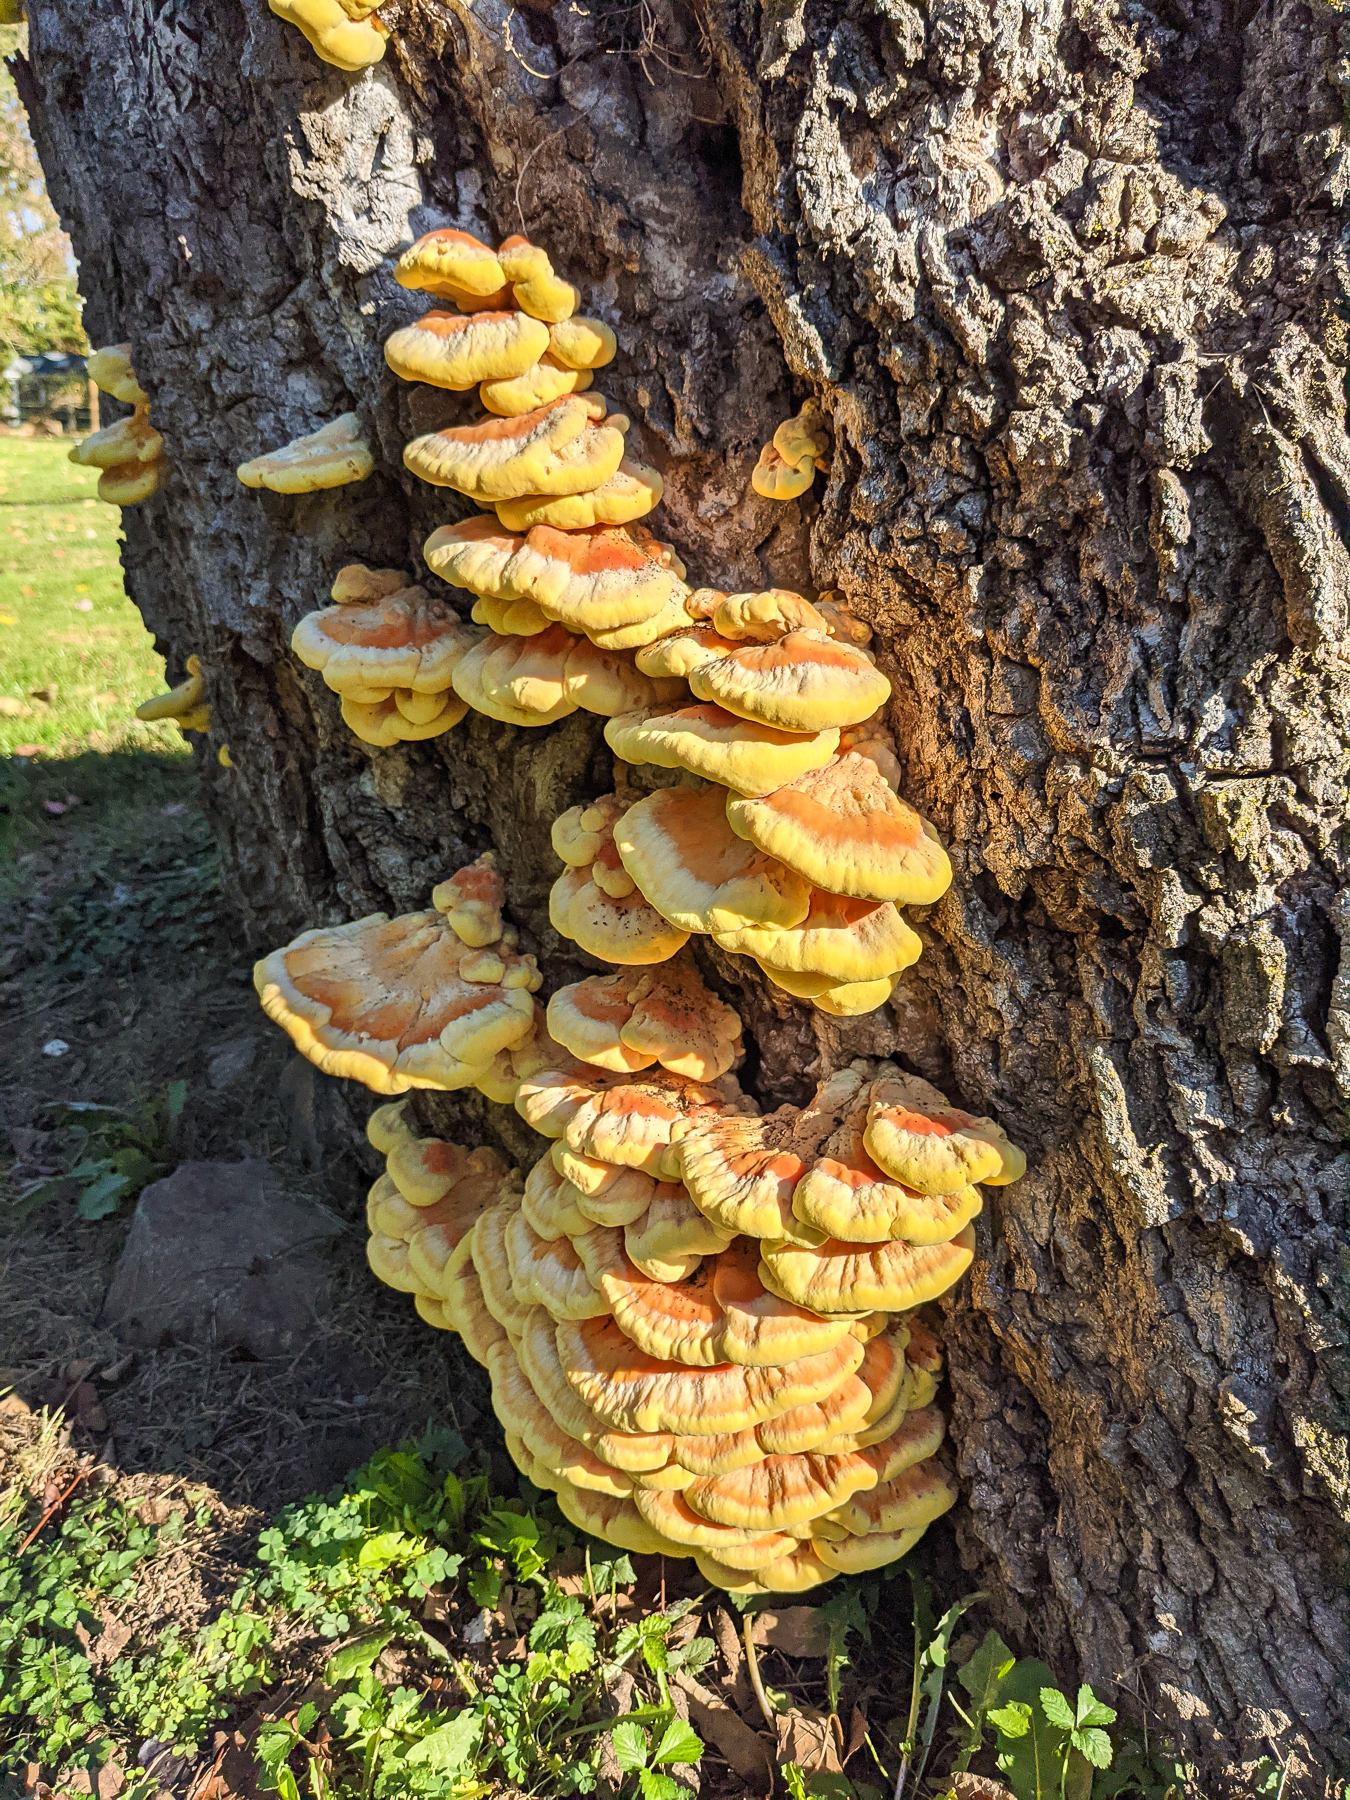 8 Chicken of the Woods Mushroom Recipes